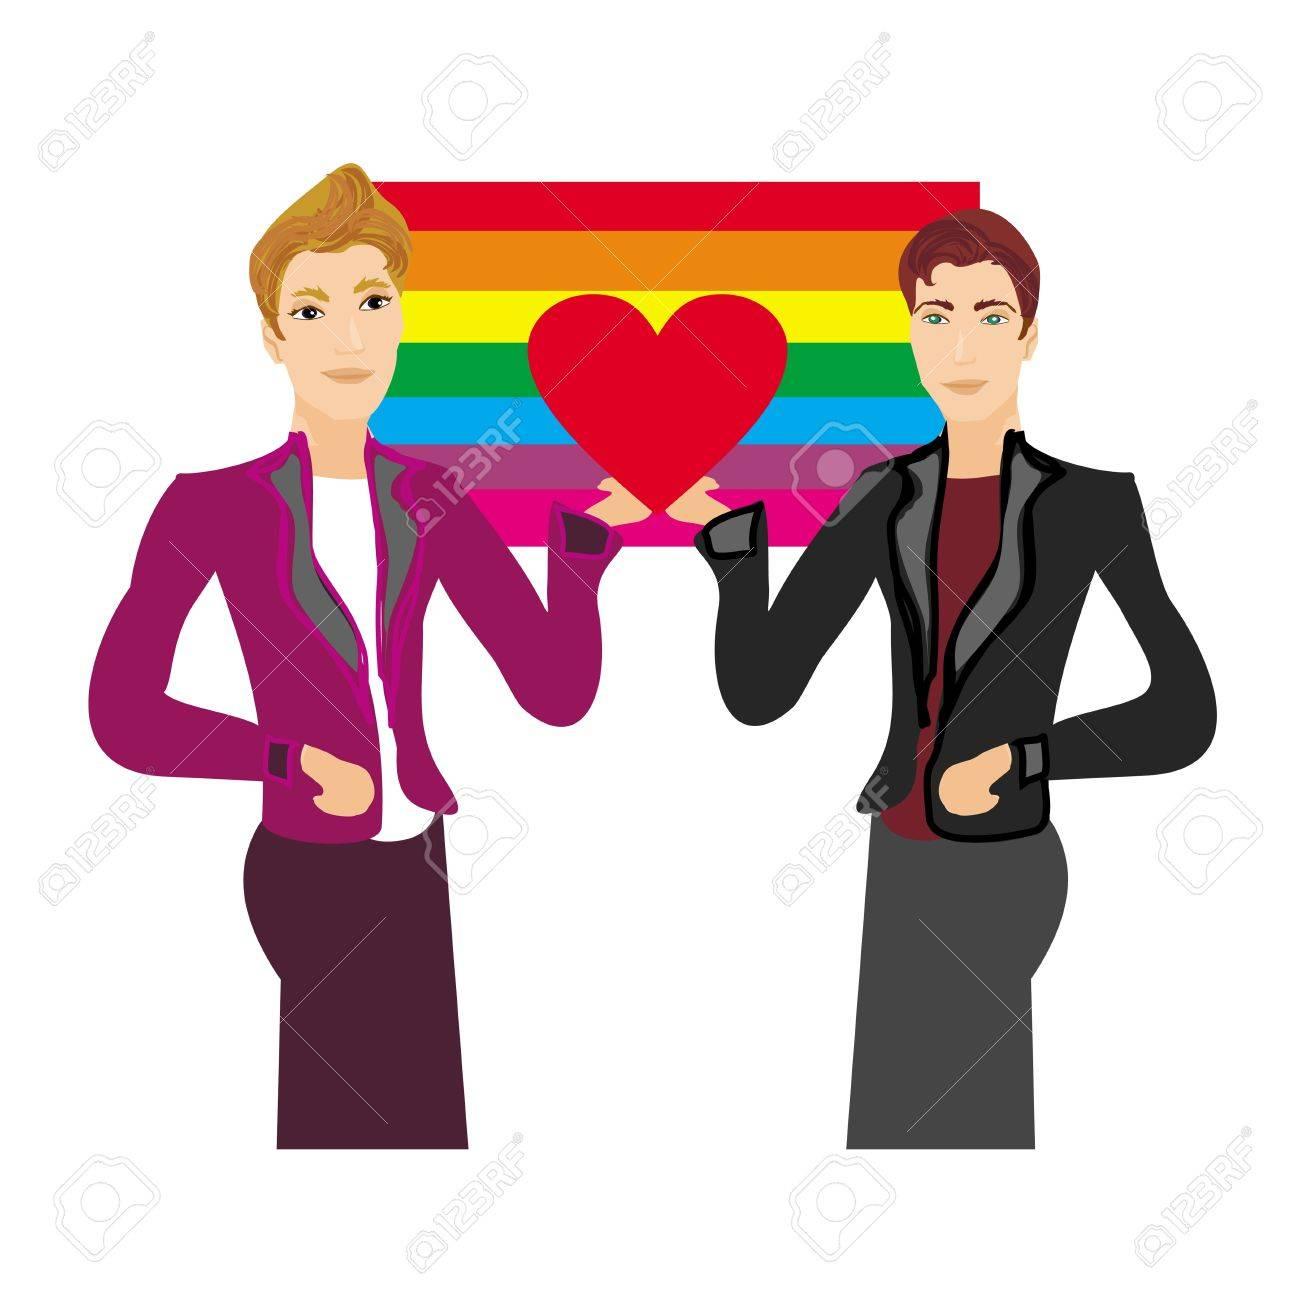 Gay Couple - 14488493